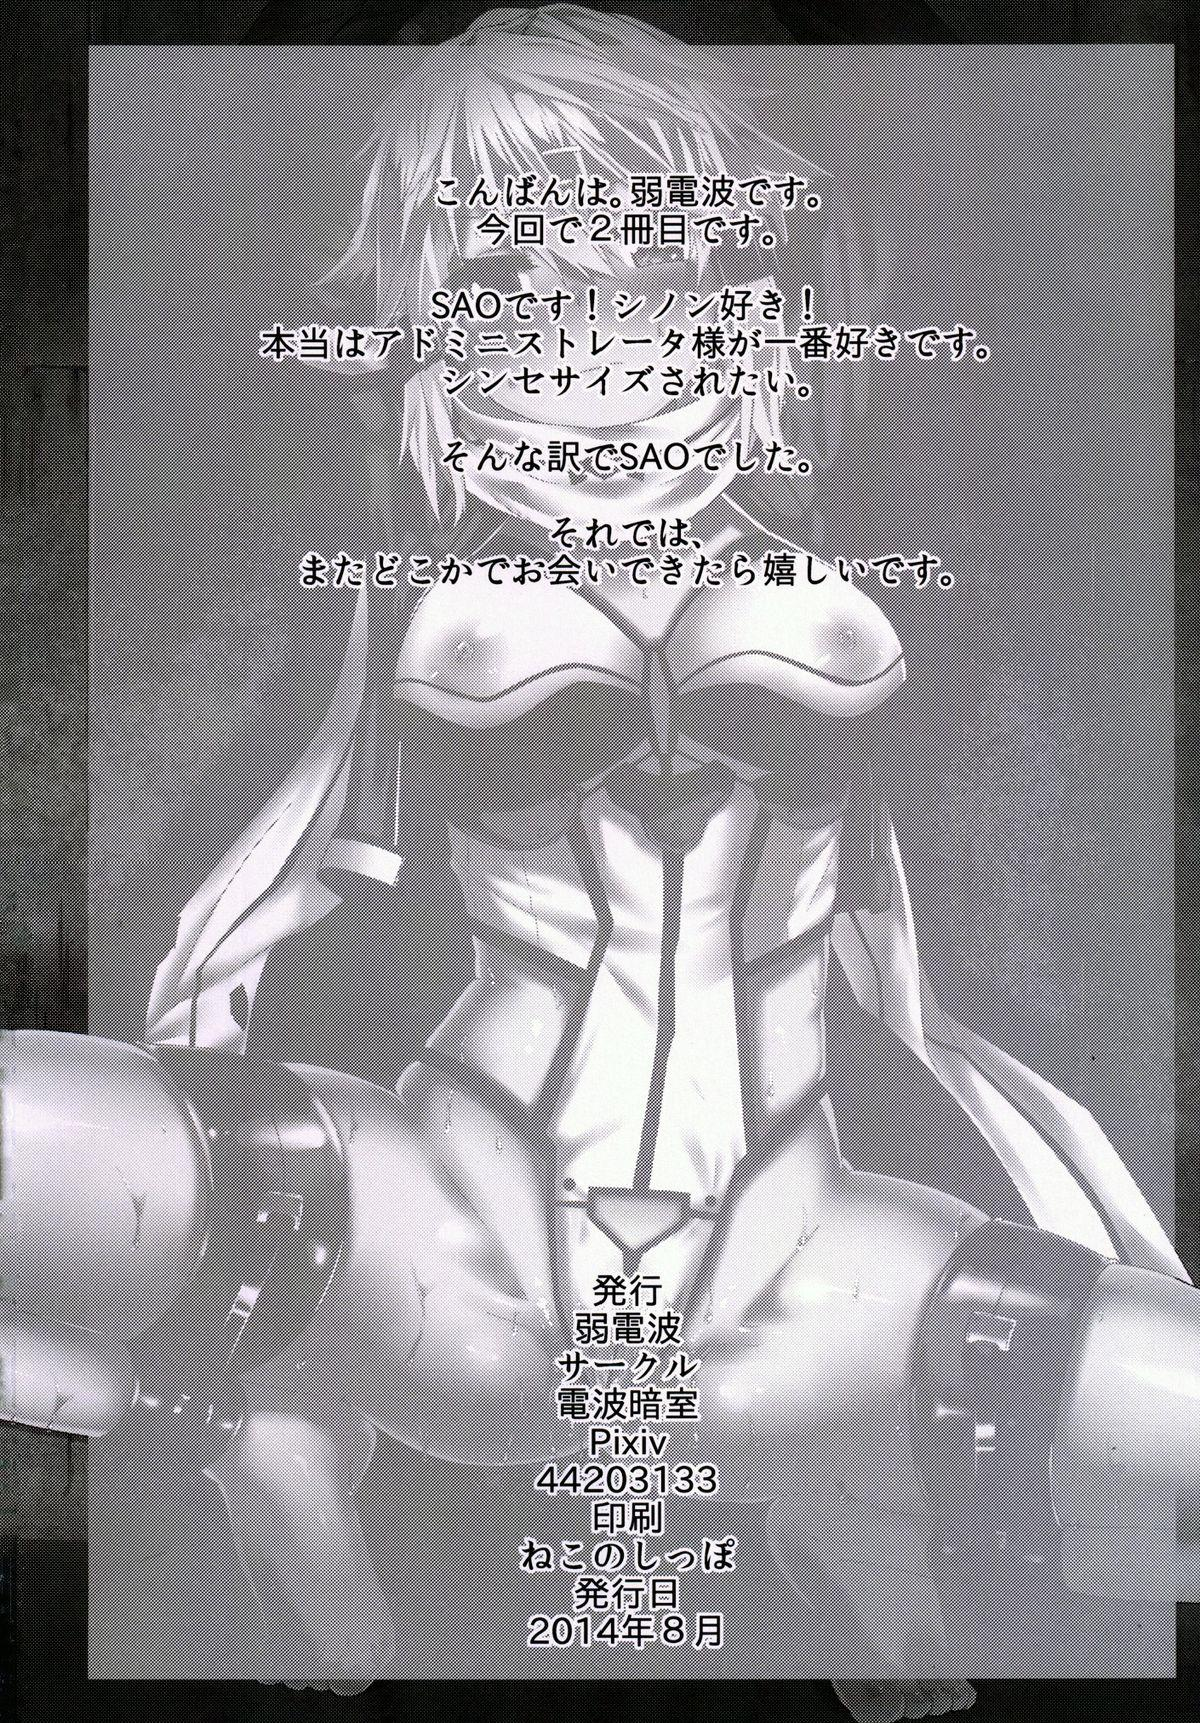 [Denpa Anshitsu (Jaku Denpa)] Asada-san ASADA-SAN (Sword Art Online) [Digital] [English] {doujin-moe.us} 24